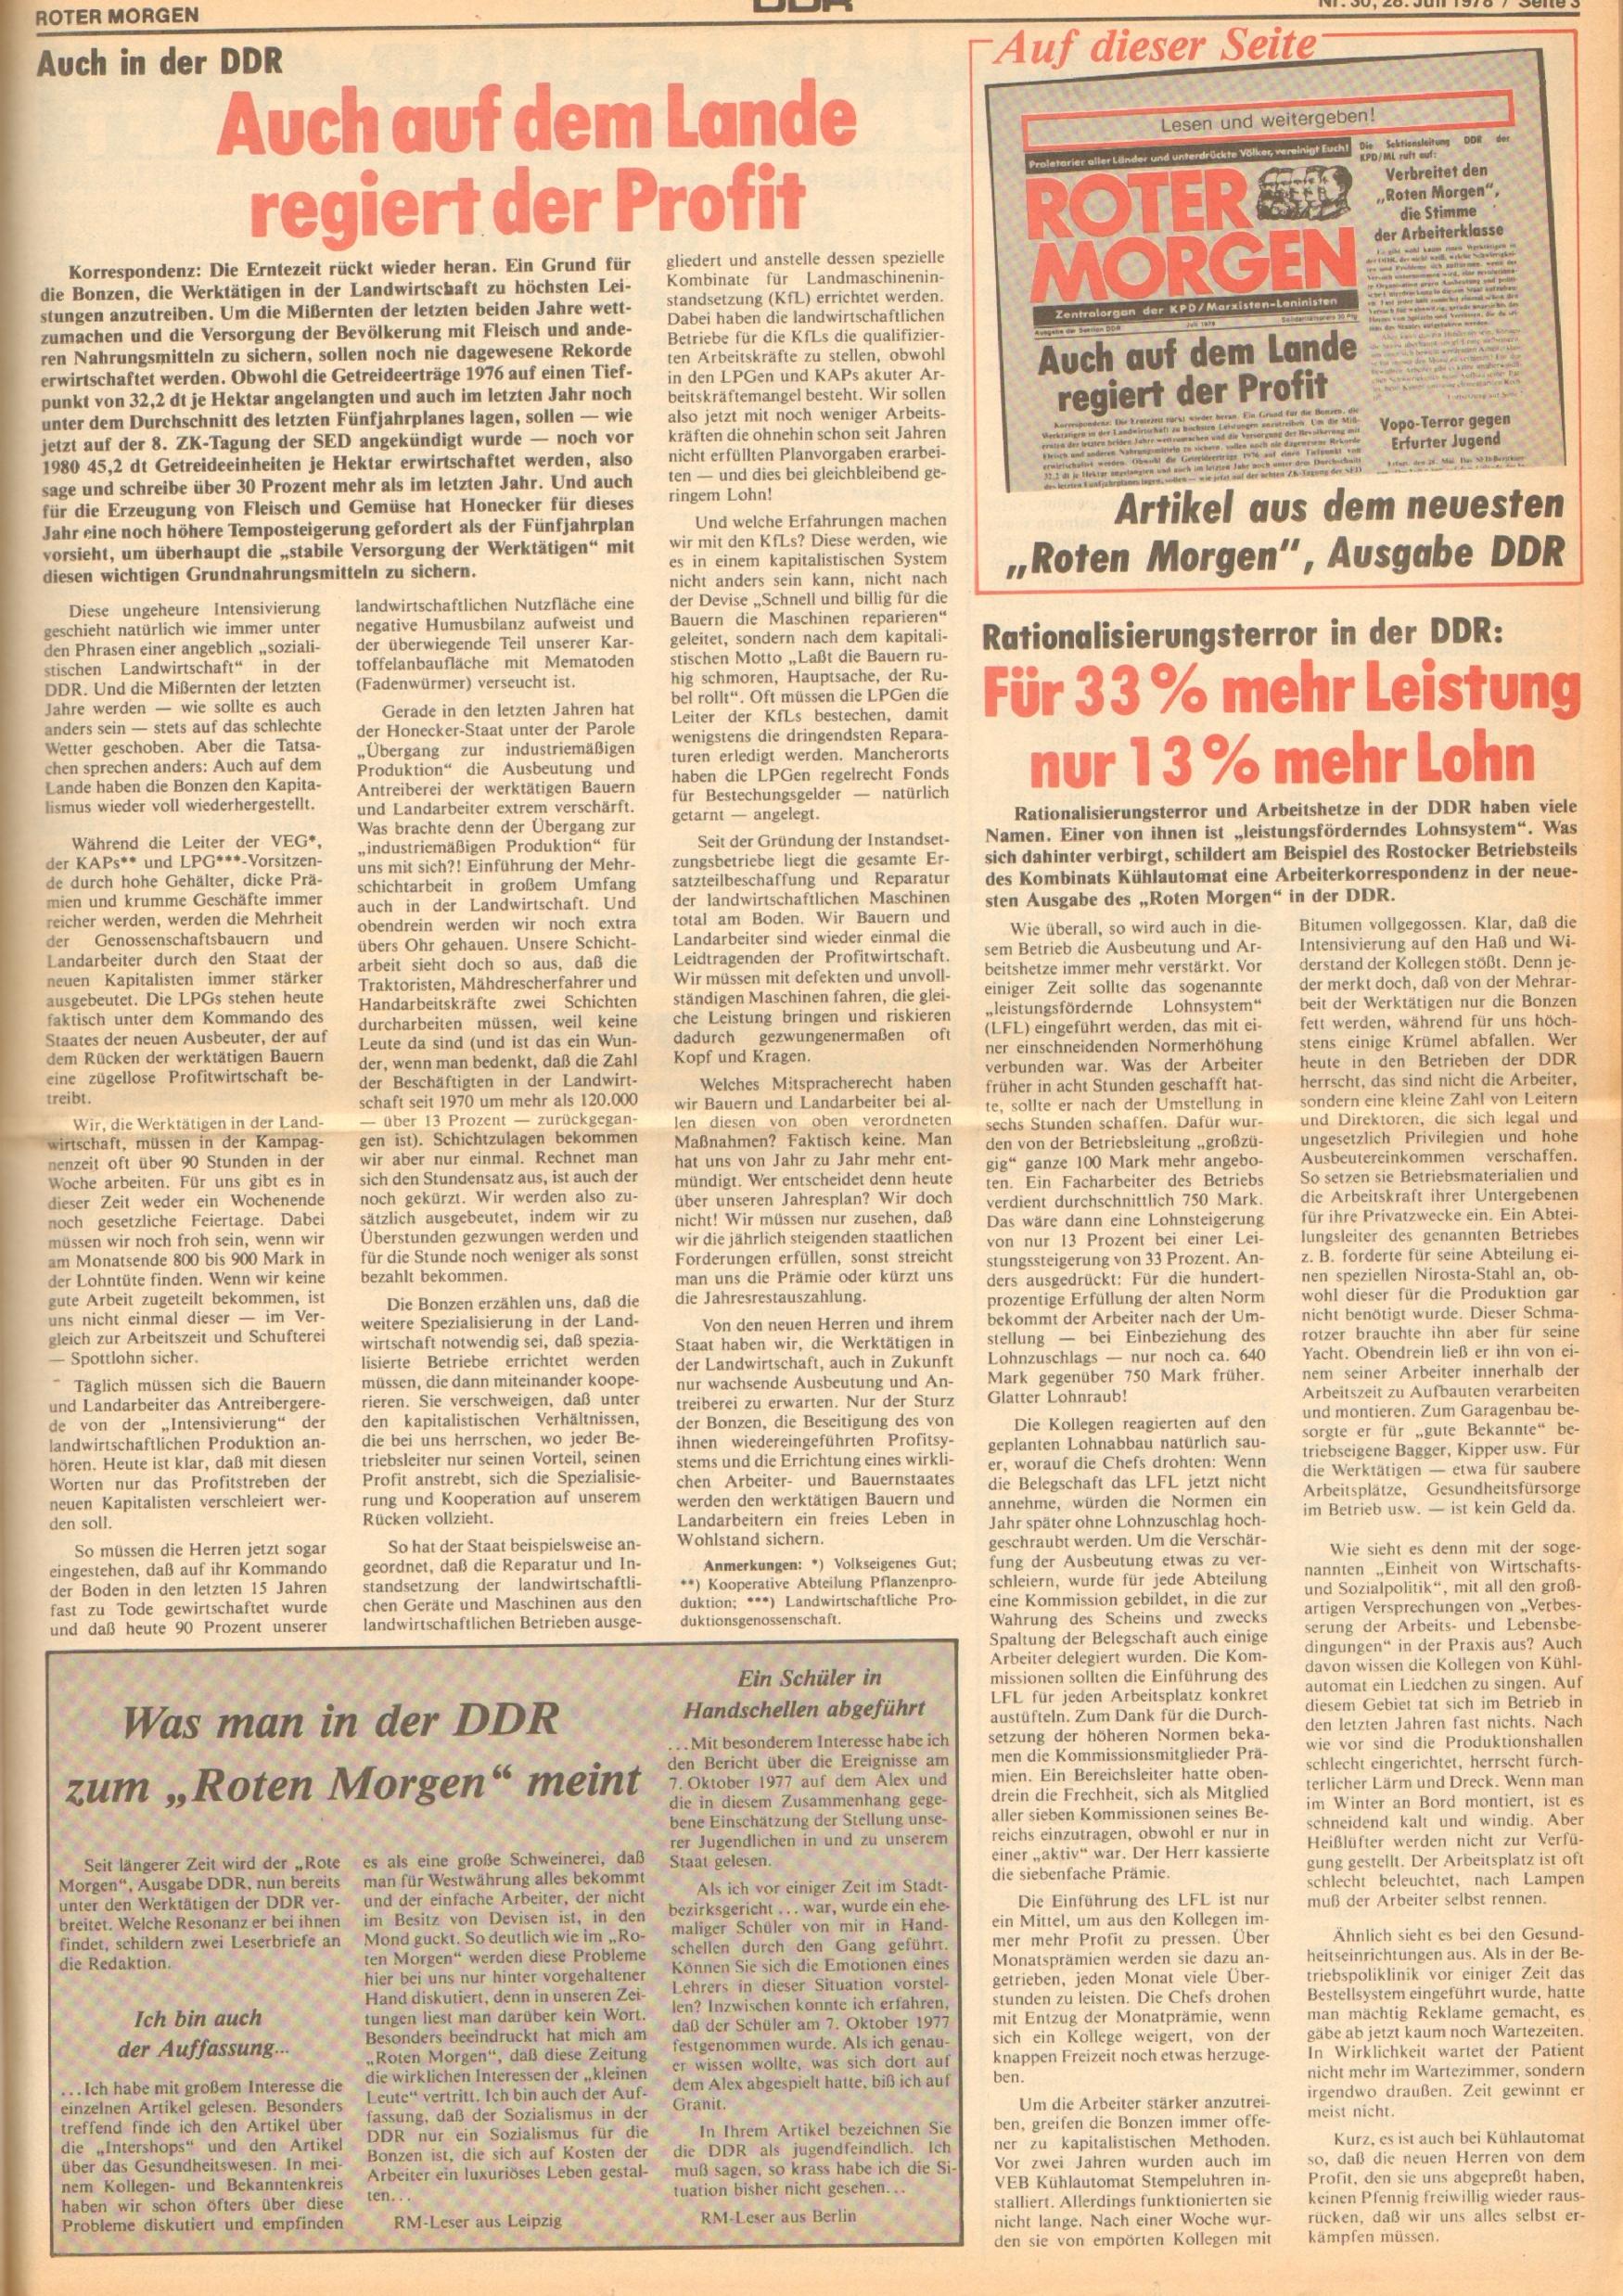 Roter Morgen, 12. Jg., 28. Juli 1978, Nr. 30, Seite 3